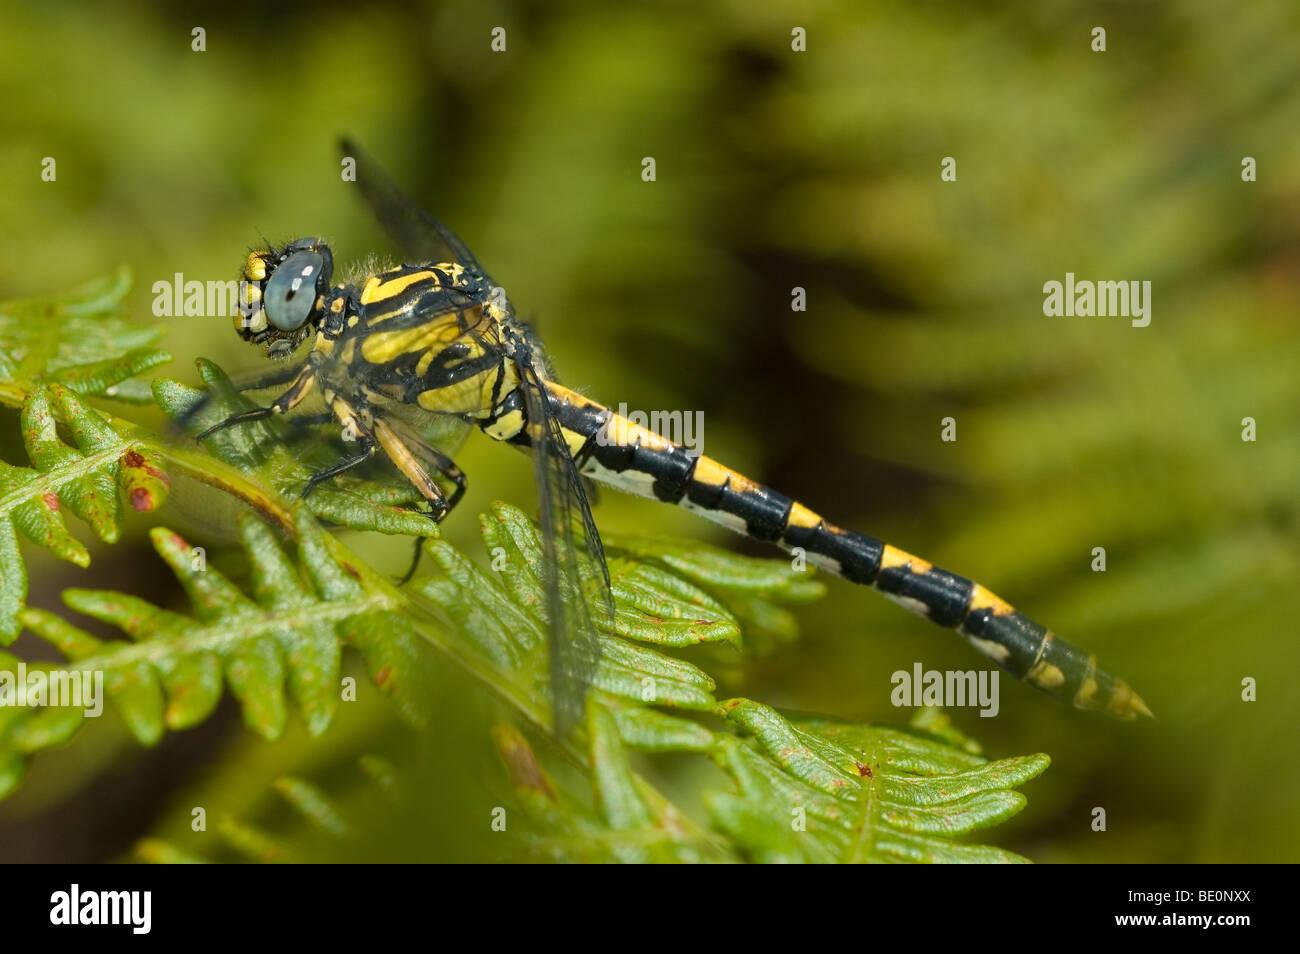 Grandi pincertail dragonfly (Onychogomphus uncatus) Immagini Stock